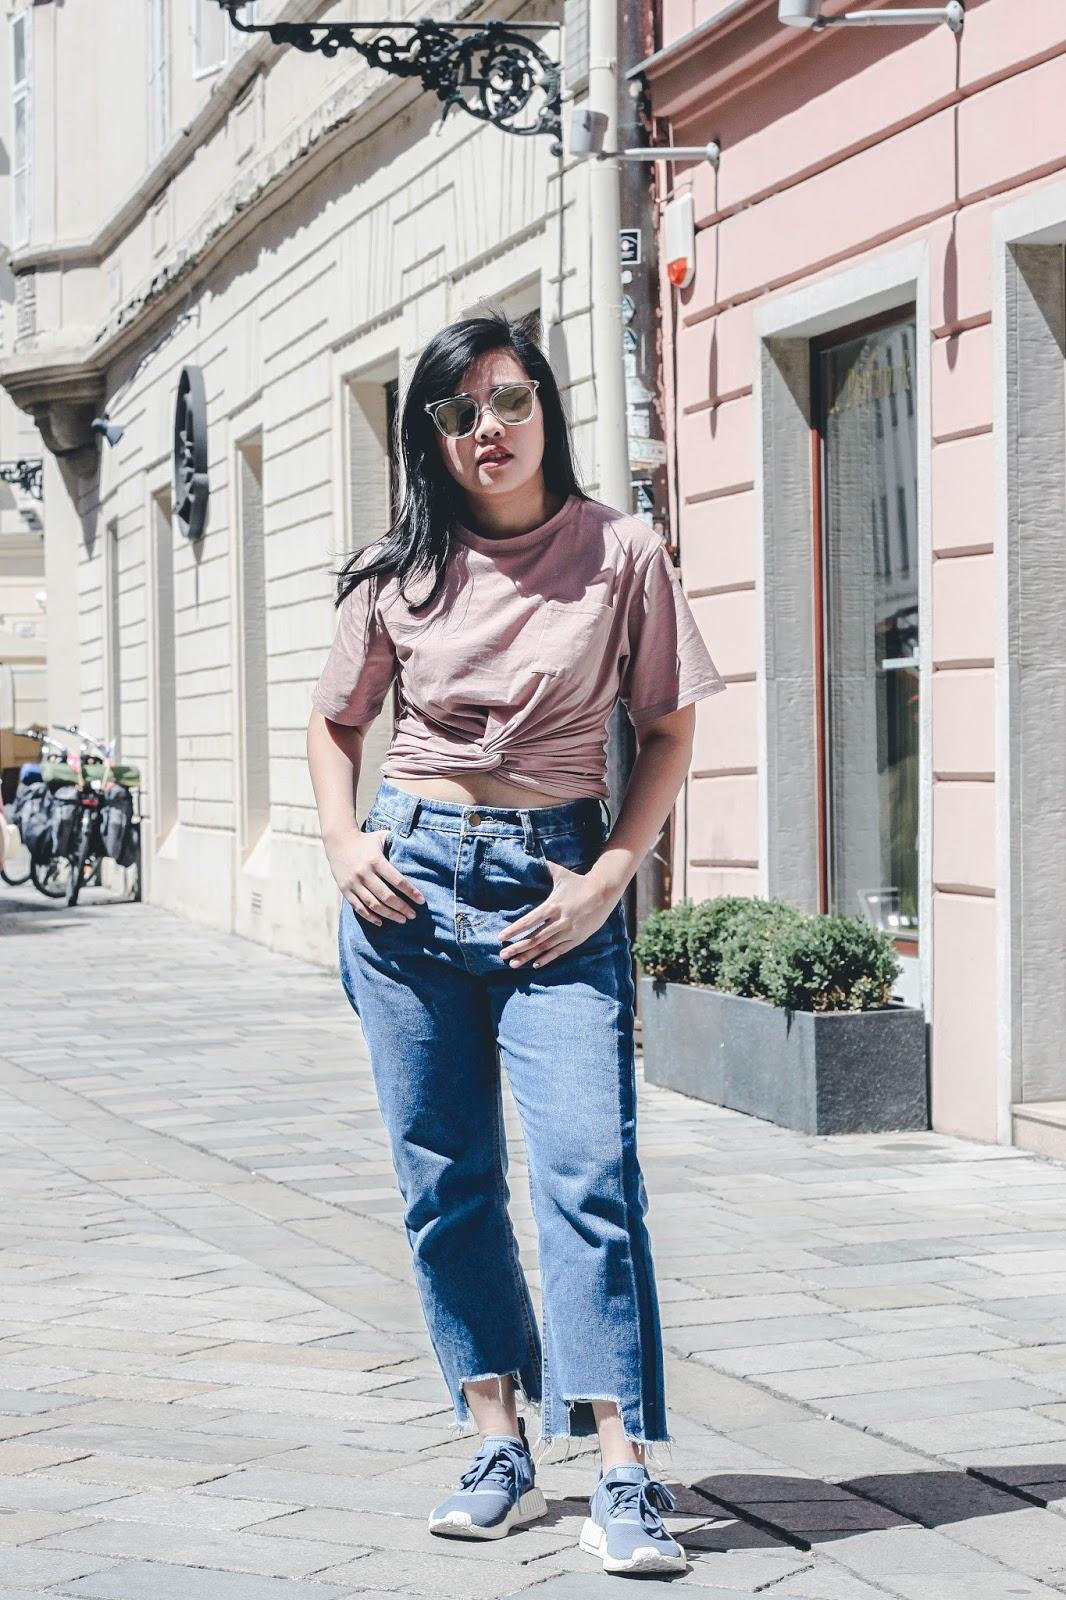 singapore blogger style street photography look book denim tshirt adidas wiwt ootd photographer travel holiday summer europe hypebeast chic